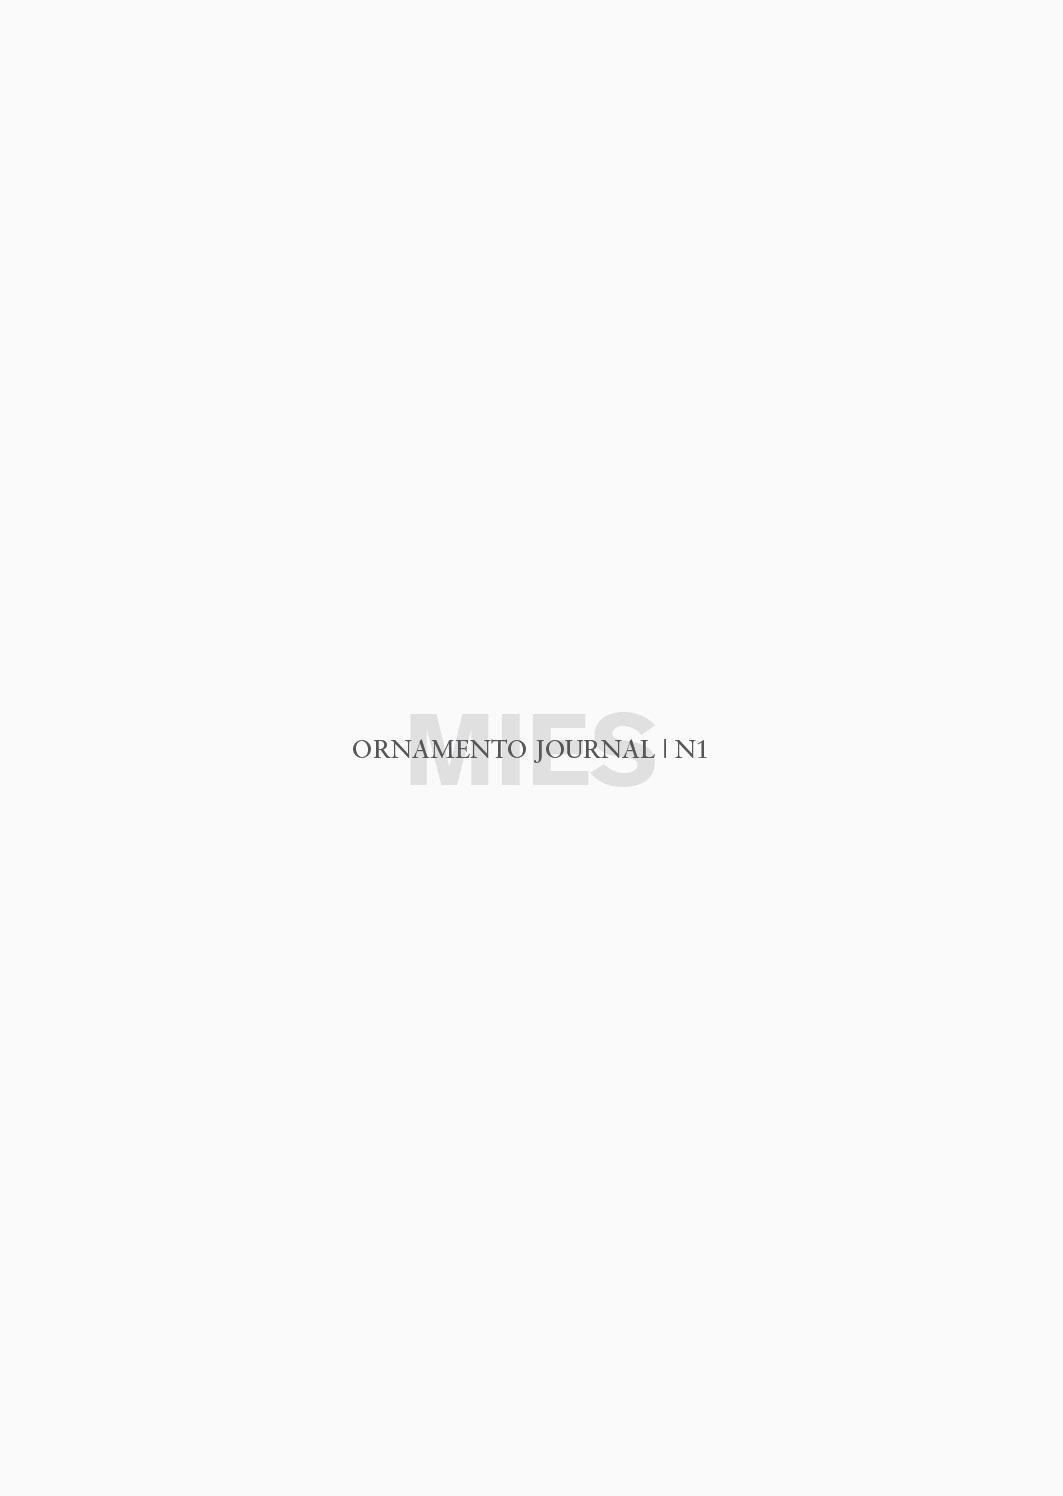 Ornamento journal 1 mies ediciones asim tricas for Ediciones asimetricas